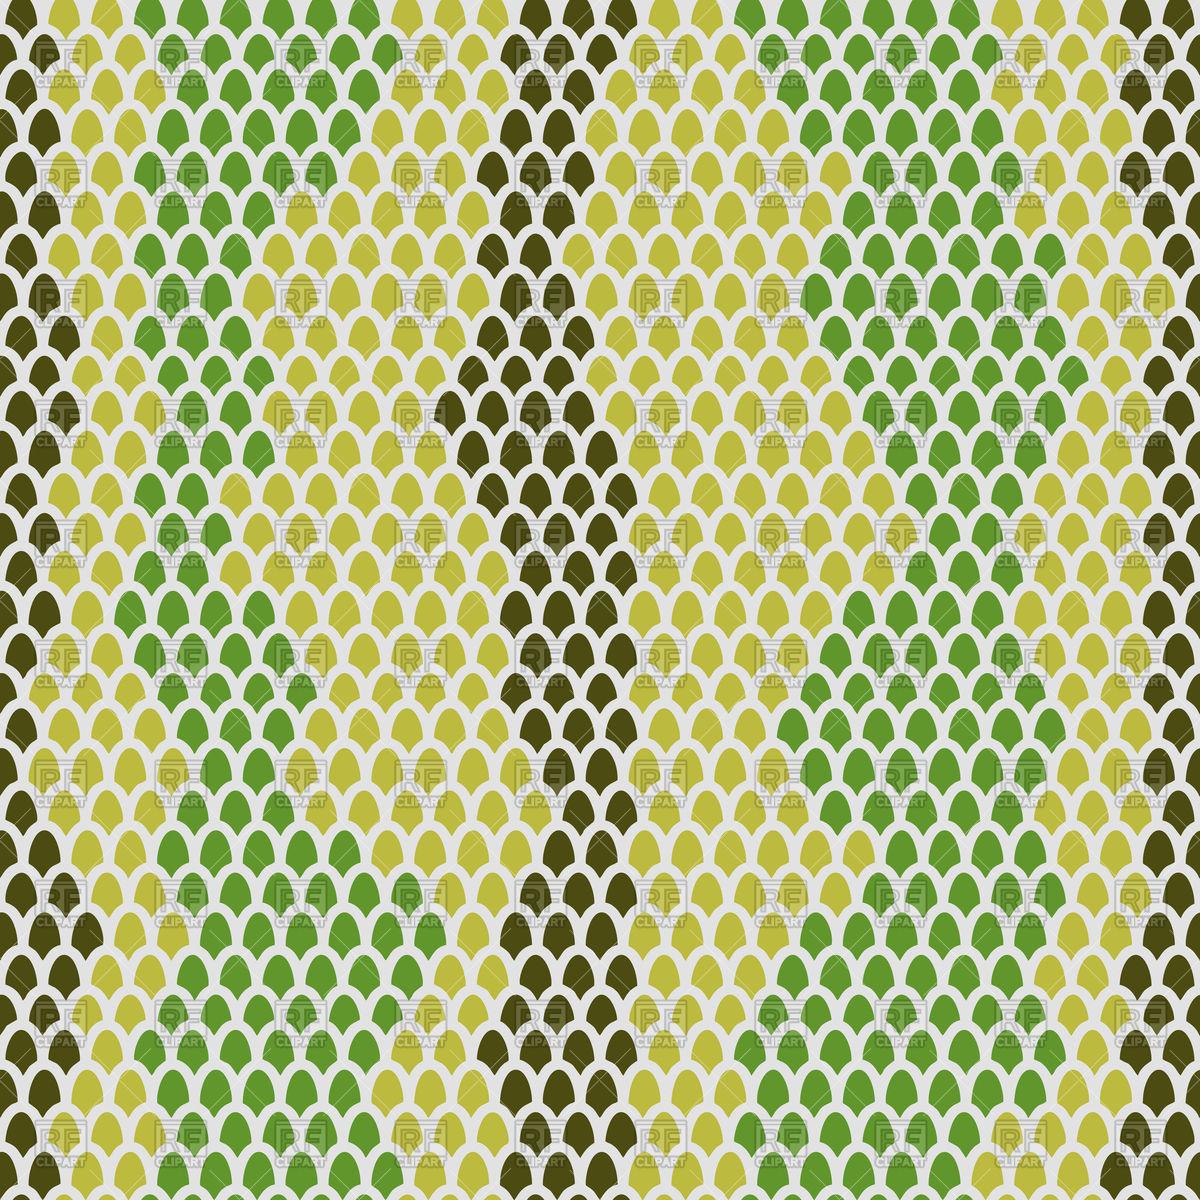 1200x1200 Snake Skin Seamless Pattern Vector Image Vector Artwork Of